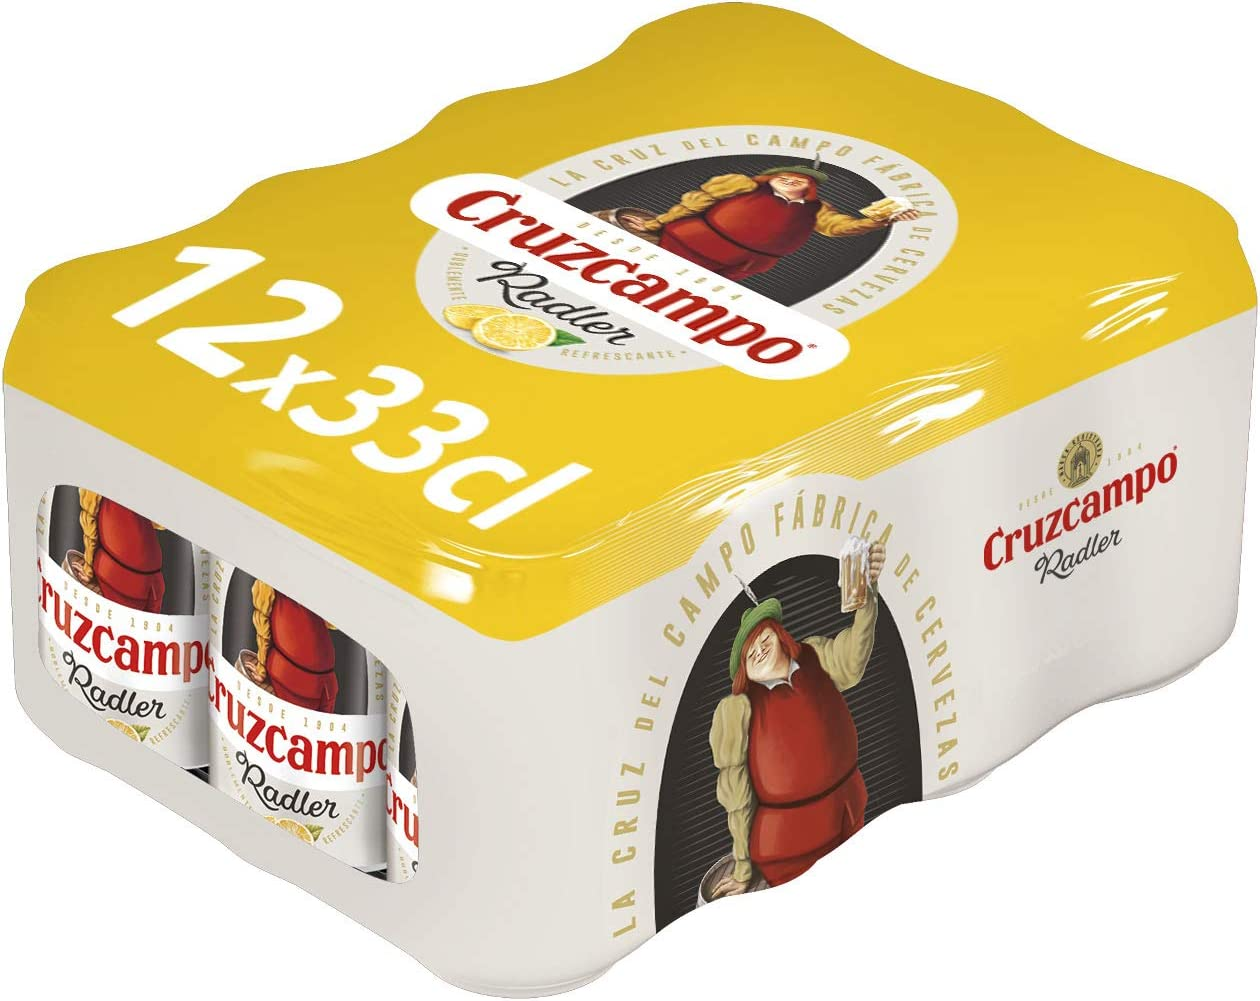 Cruzcampo Radler Cerveza Limón - Paquete de 12 x 330 ml (Total: 3960 ml)